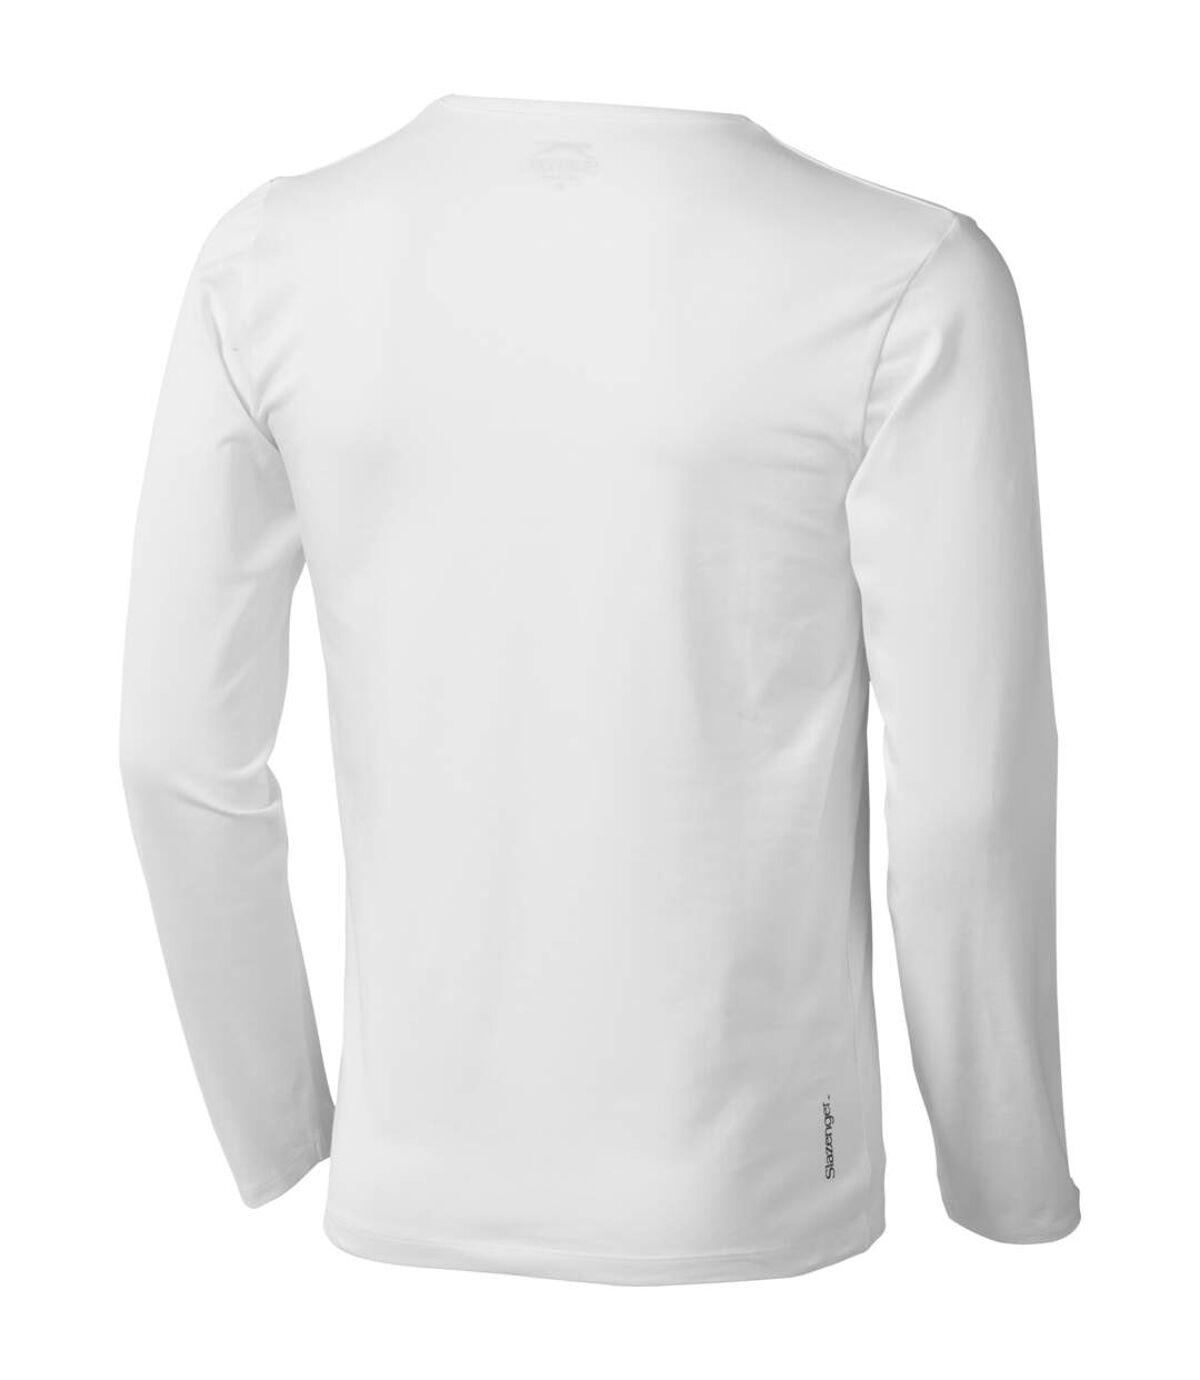 Slazenger - T-shirt manches longues Curve - Homme (Blanc) - UTPF1725